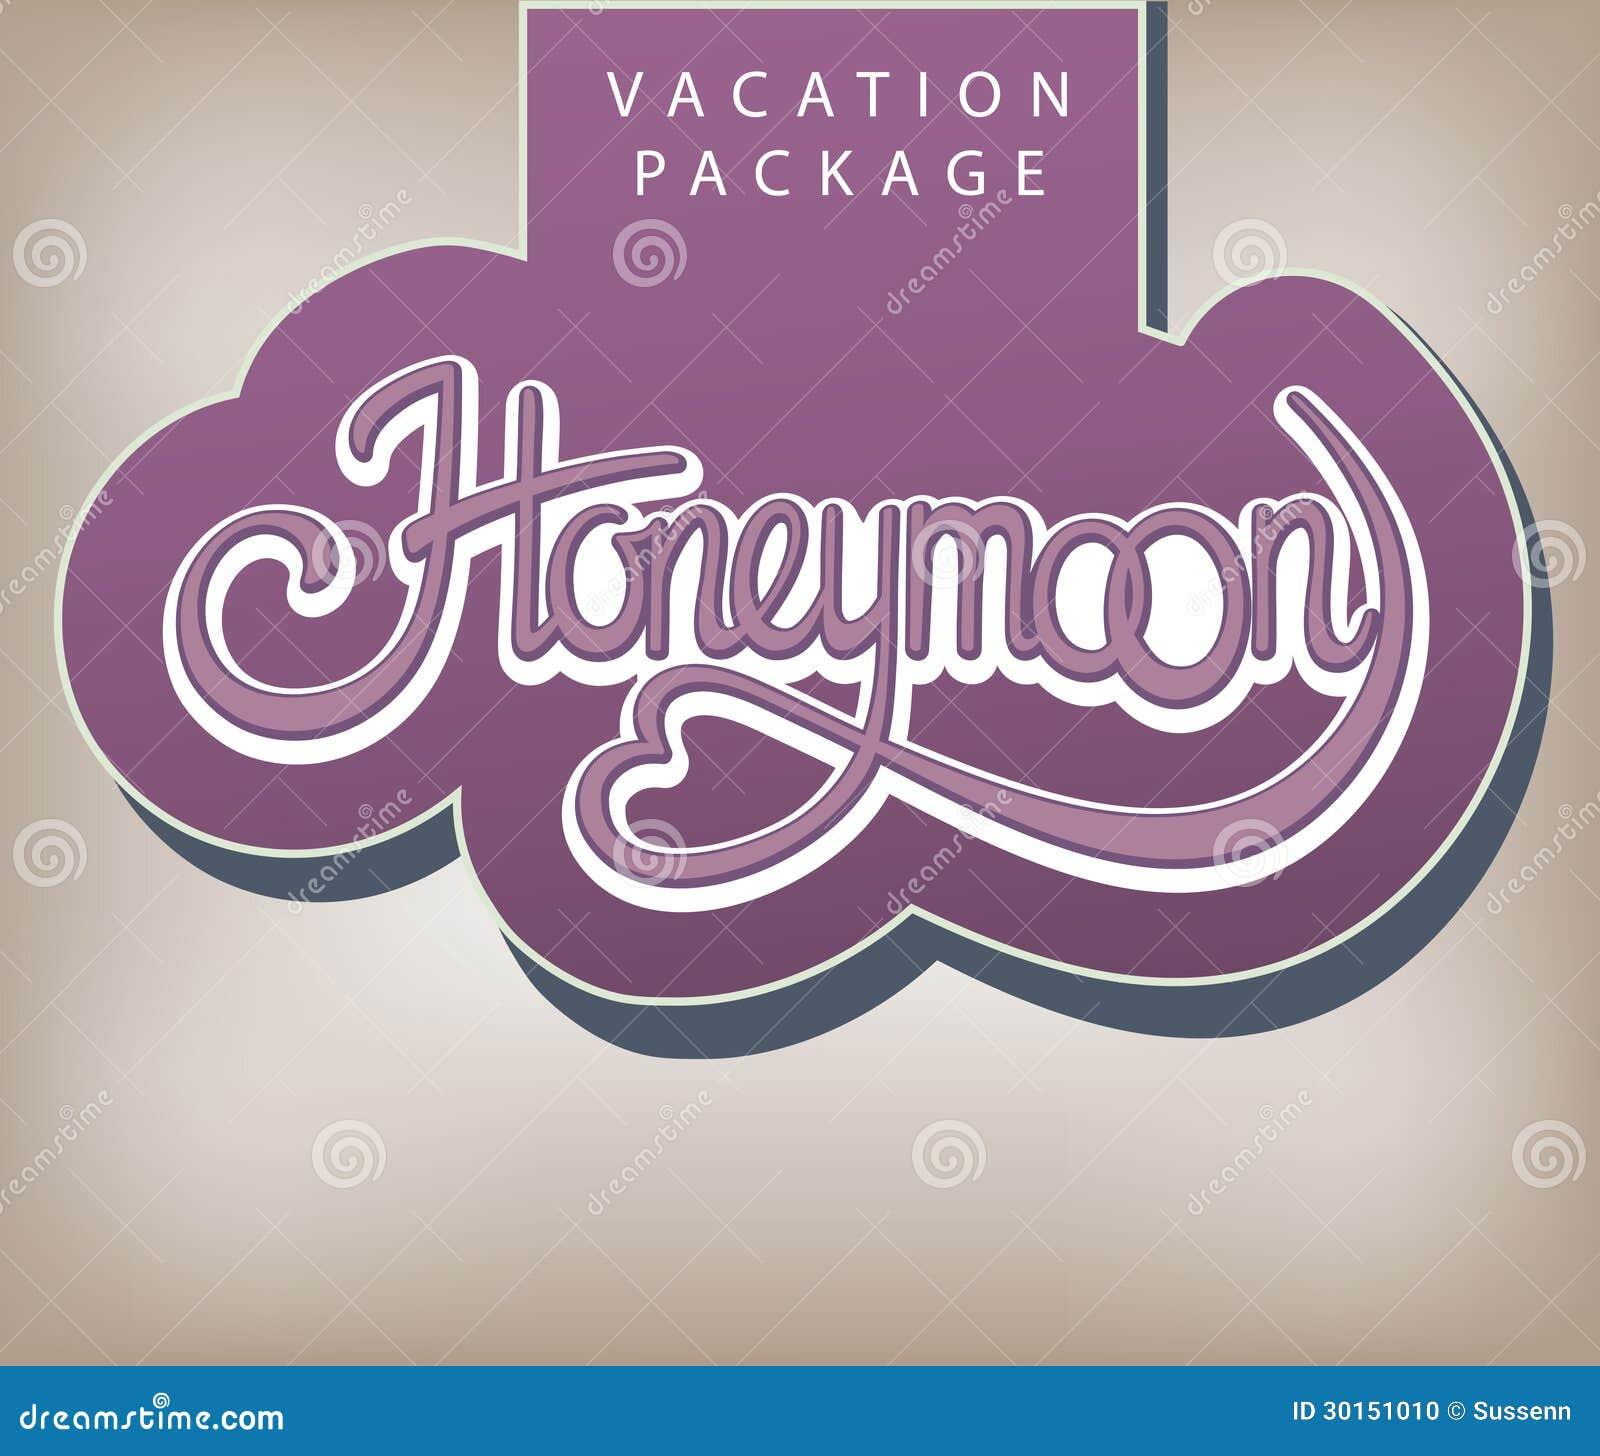 Vacation package Honeymoon